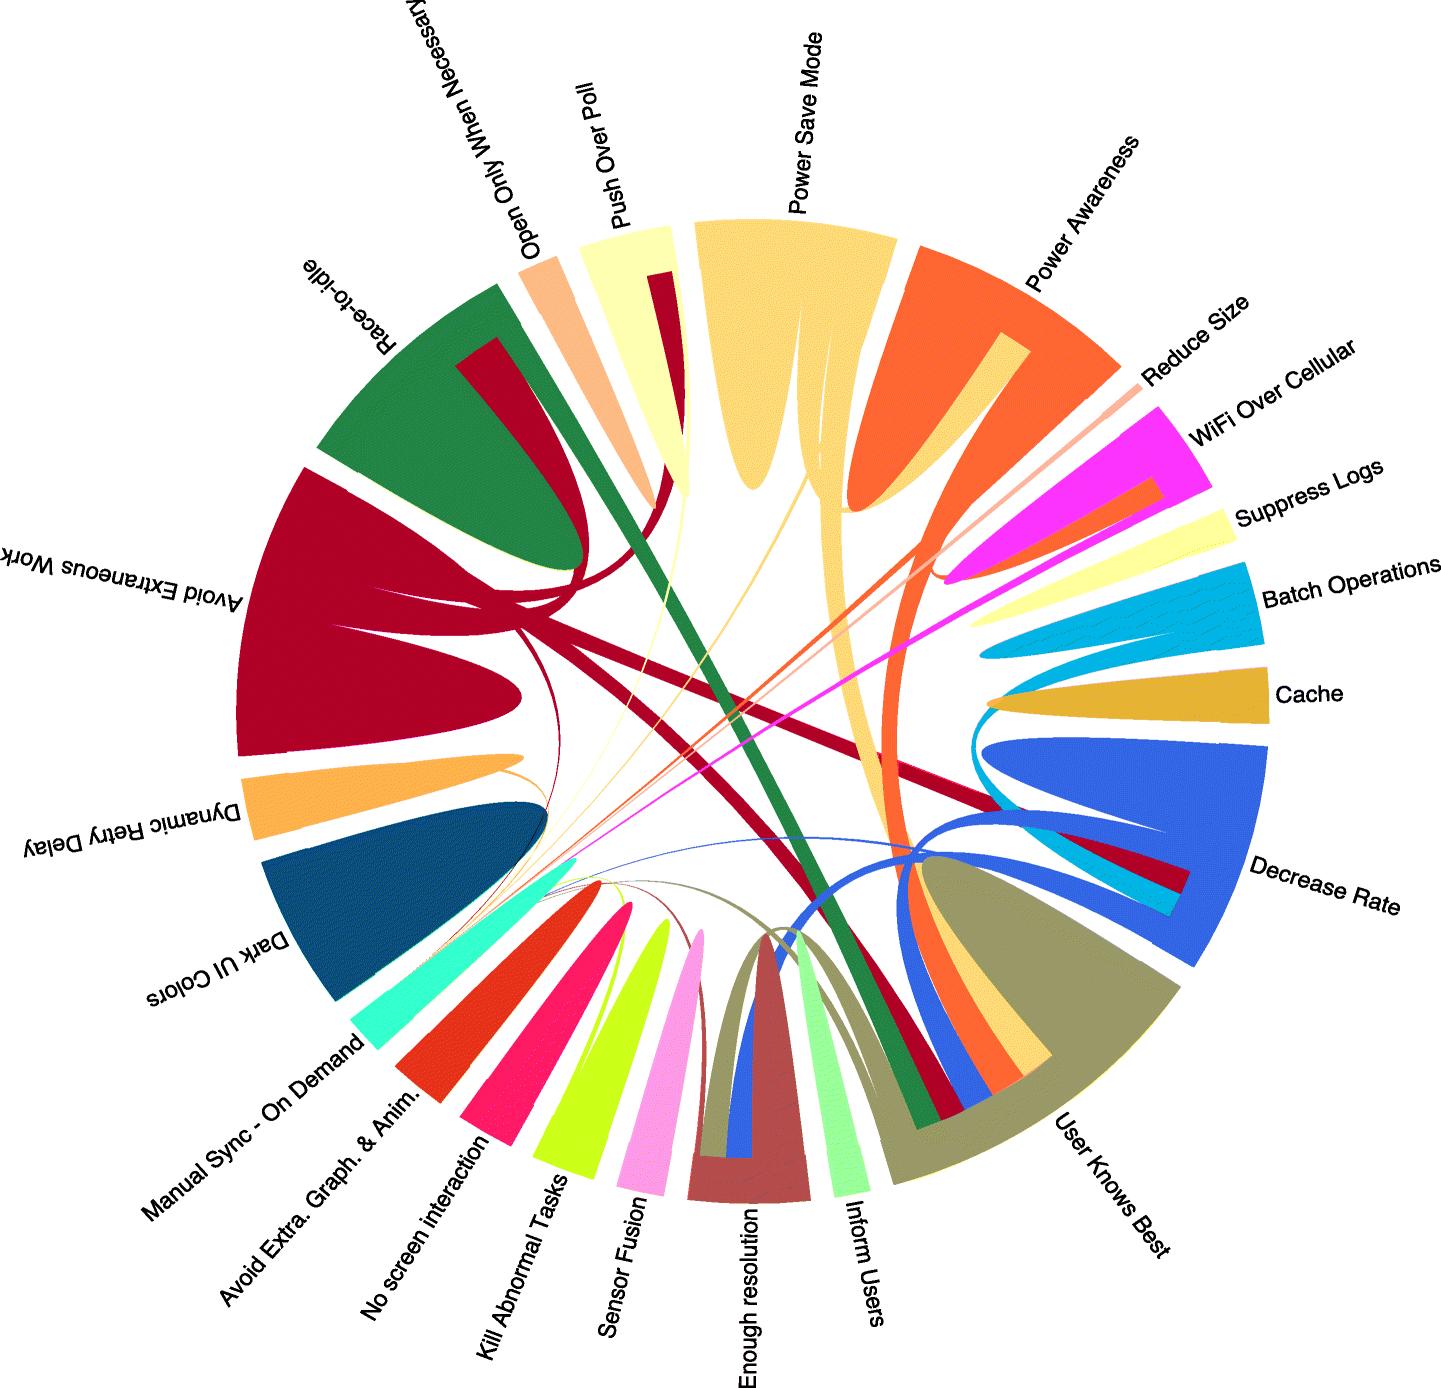 Catalog of energy patterns for mobile applications | SpringerLink